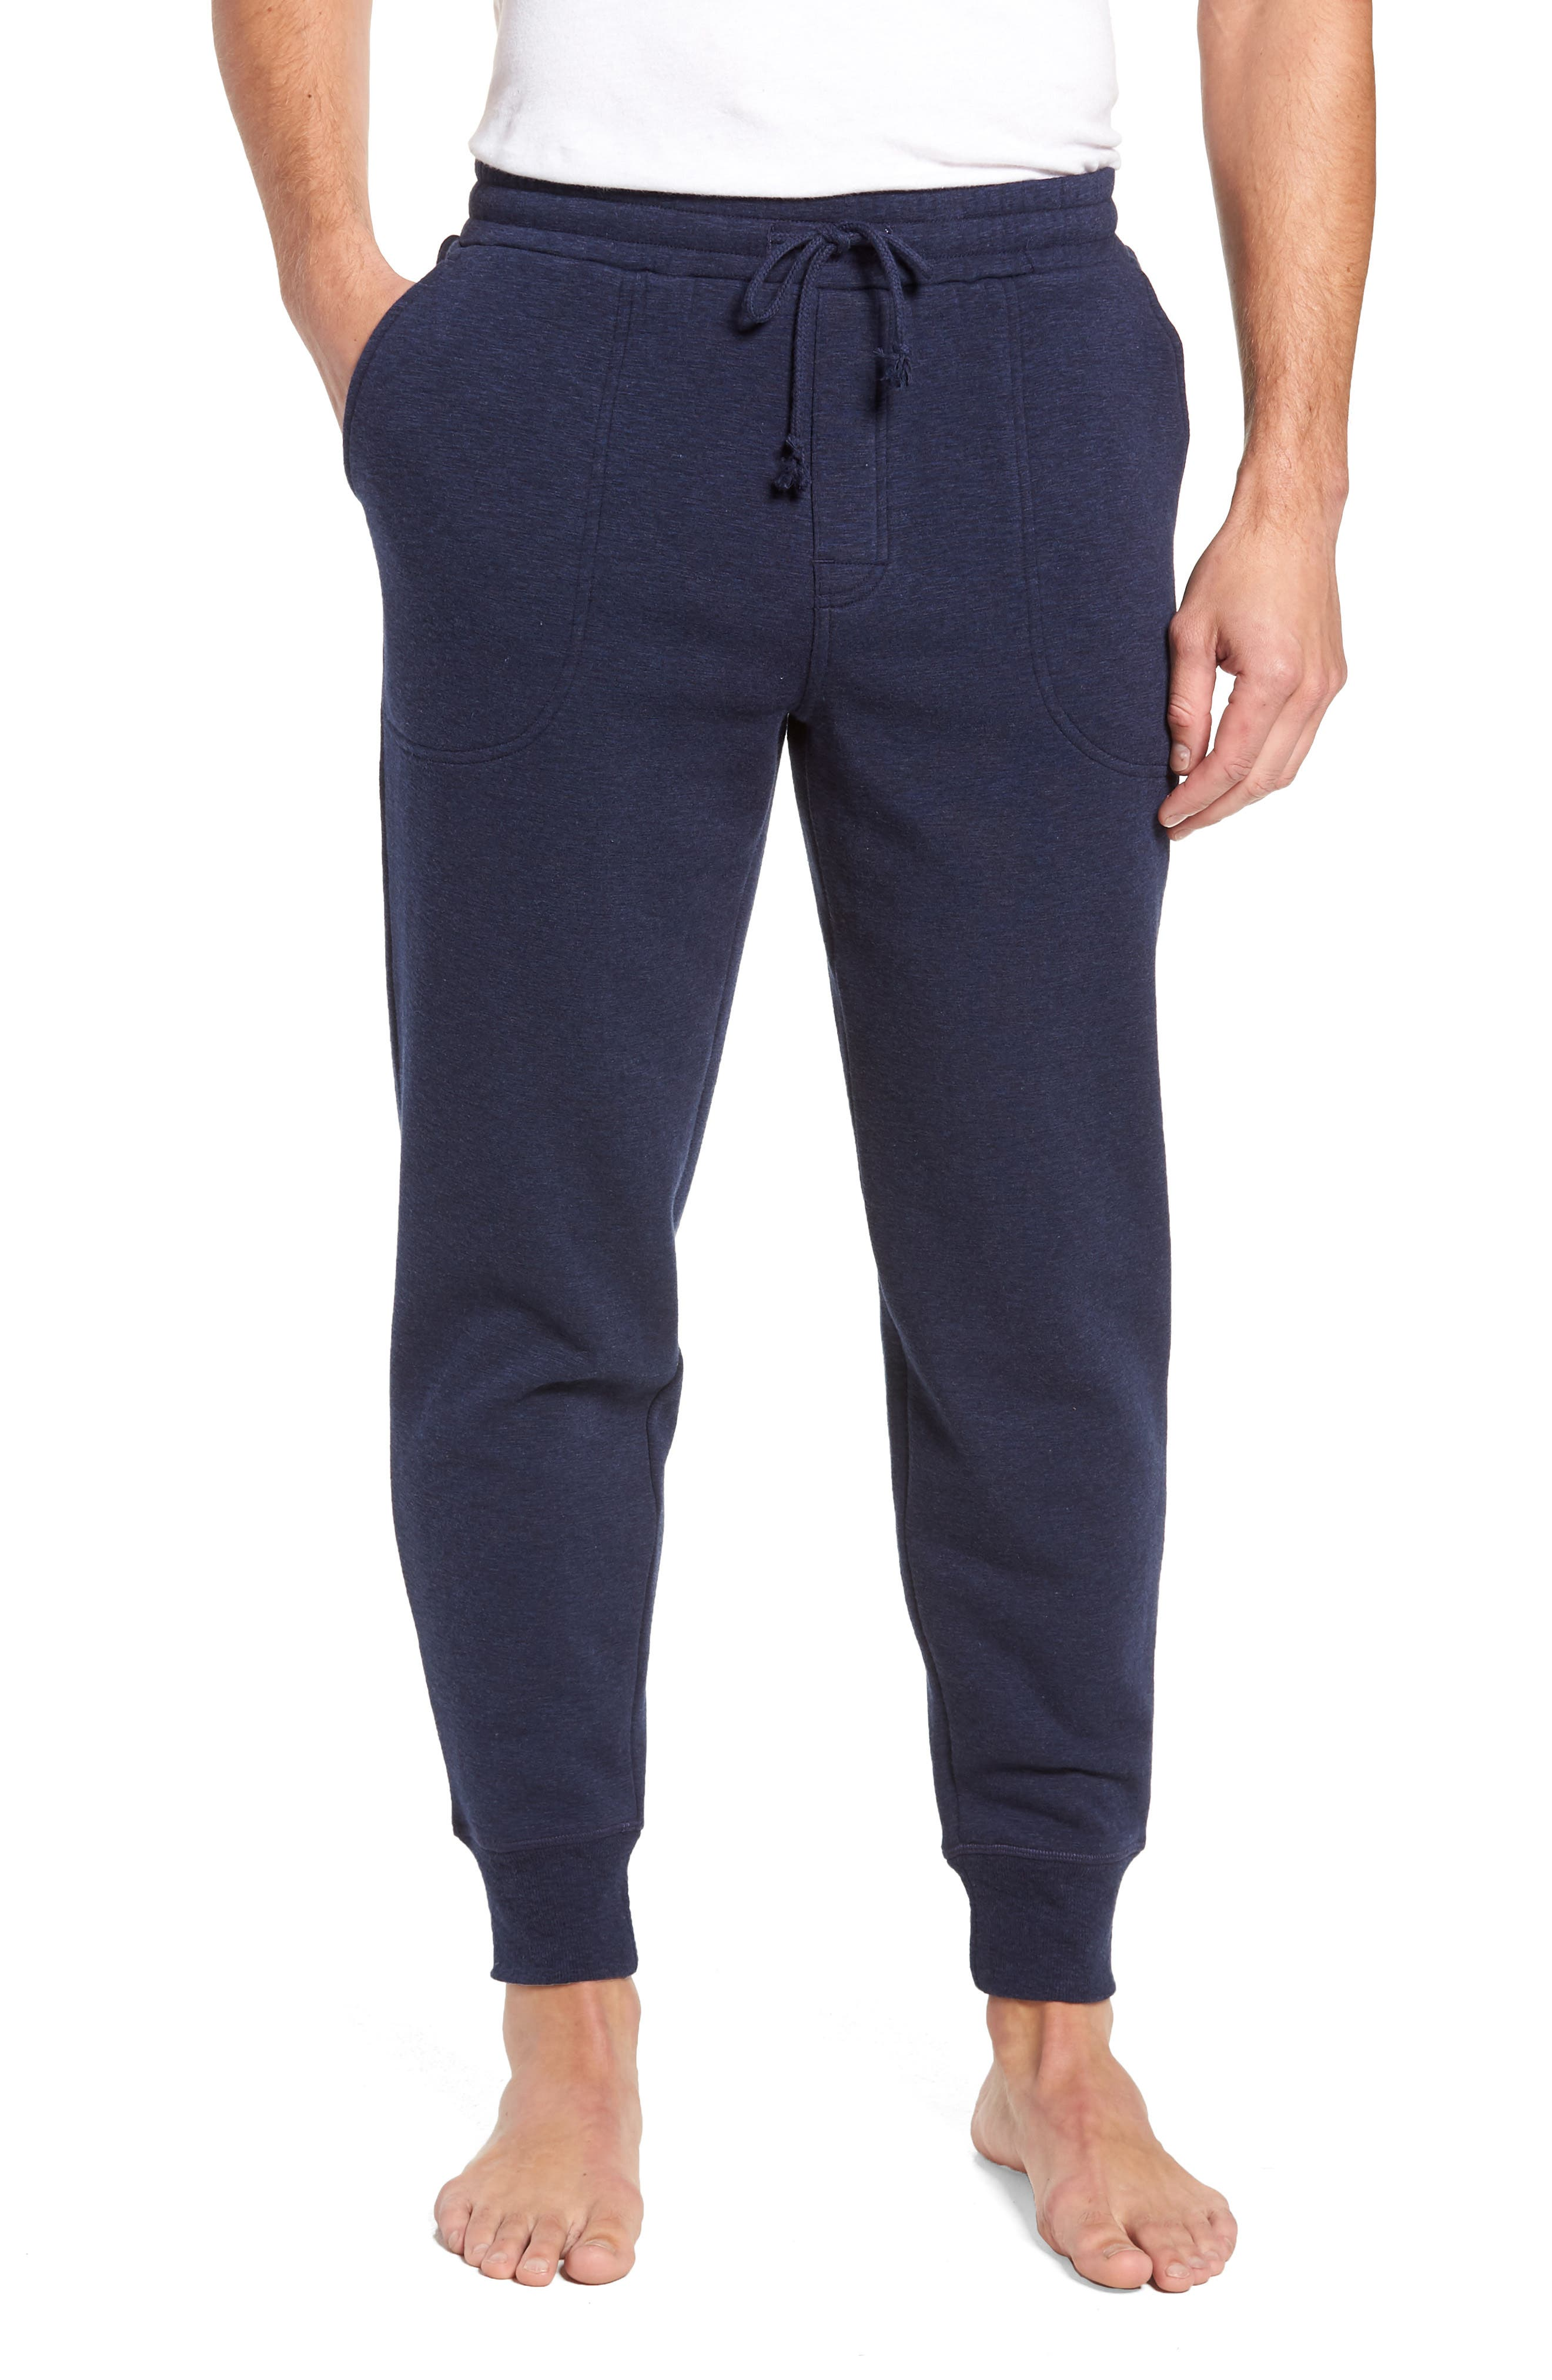 French Terry Pajama Pants,                         Main,                         color, DARK NAVY HEATHER